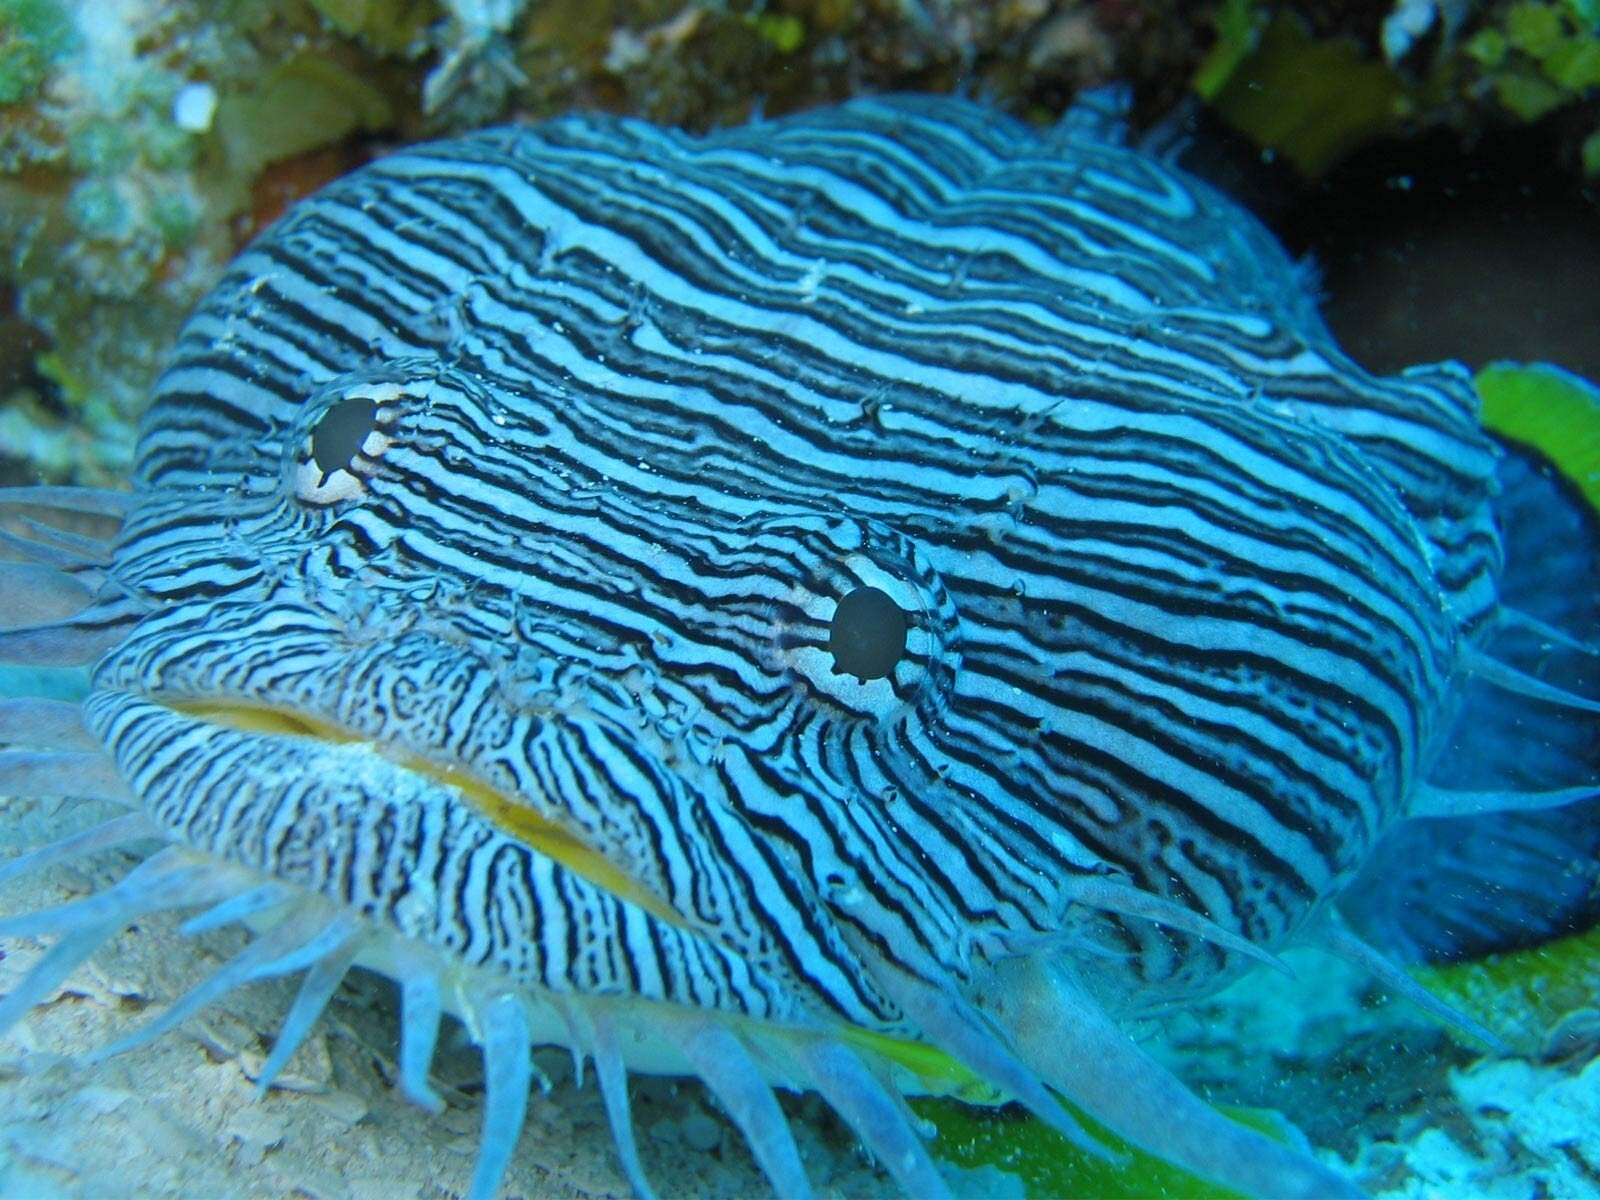 Beautiful Sea Fish Wallpaper Hd Wallpapers